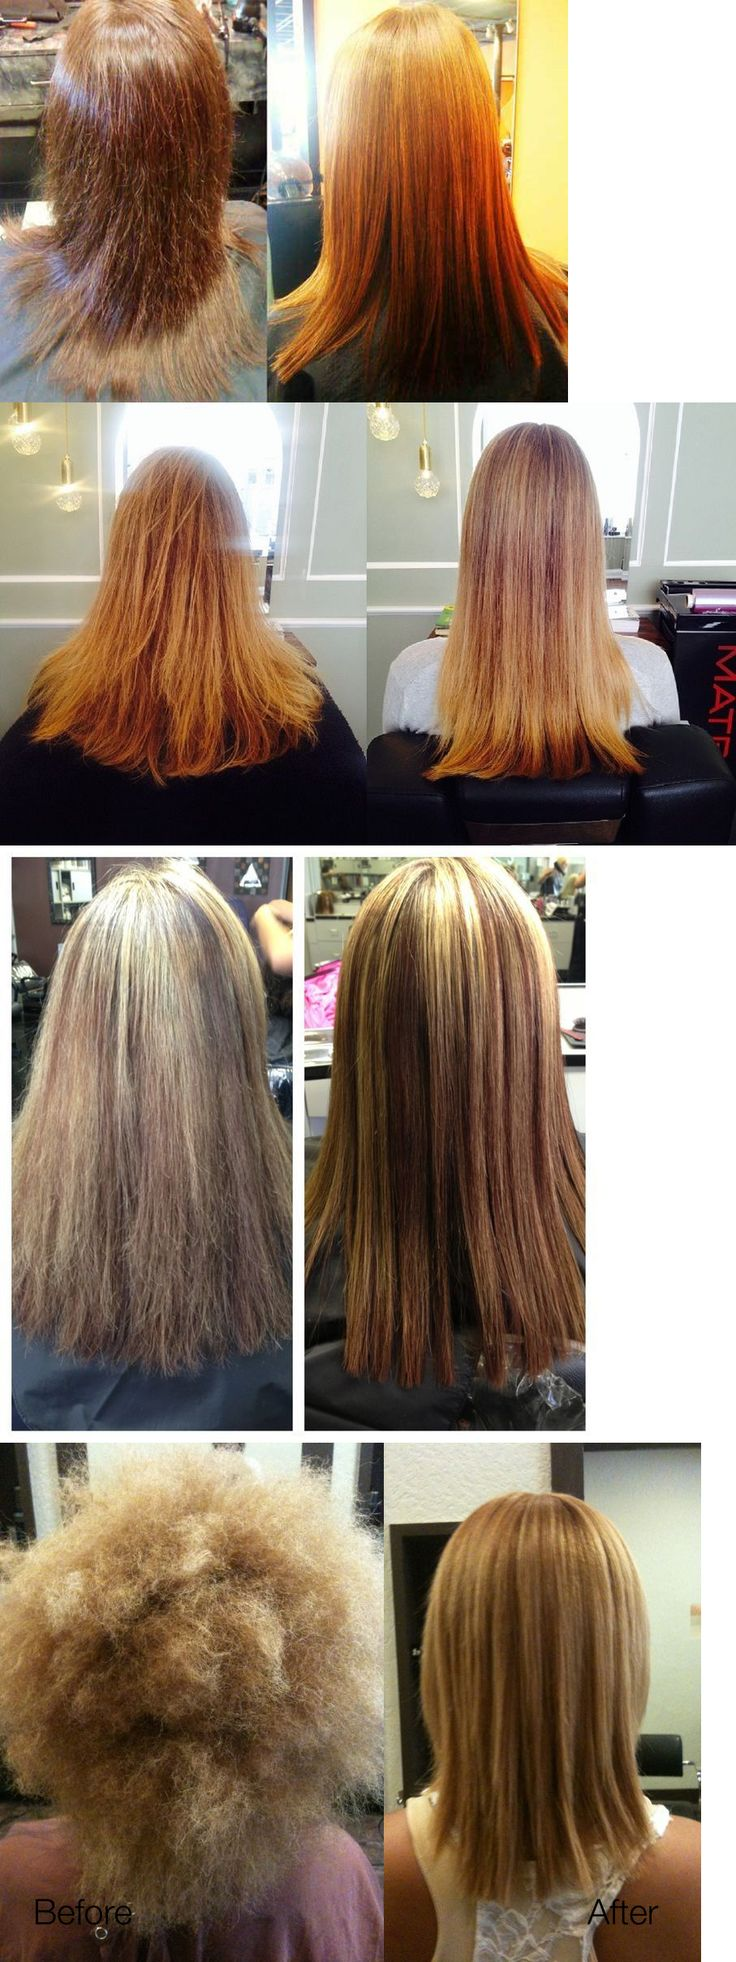 Straight perm edinburgh - Relaxers And Straightening Prod Brazilian Keratin Hair Straightening Treatment Blow Dry 1000ml 33 8 Fl Oz